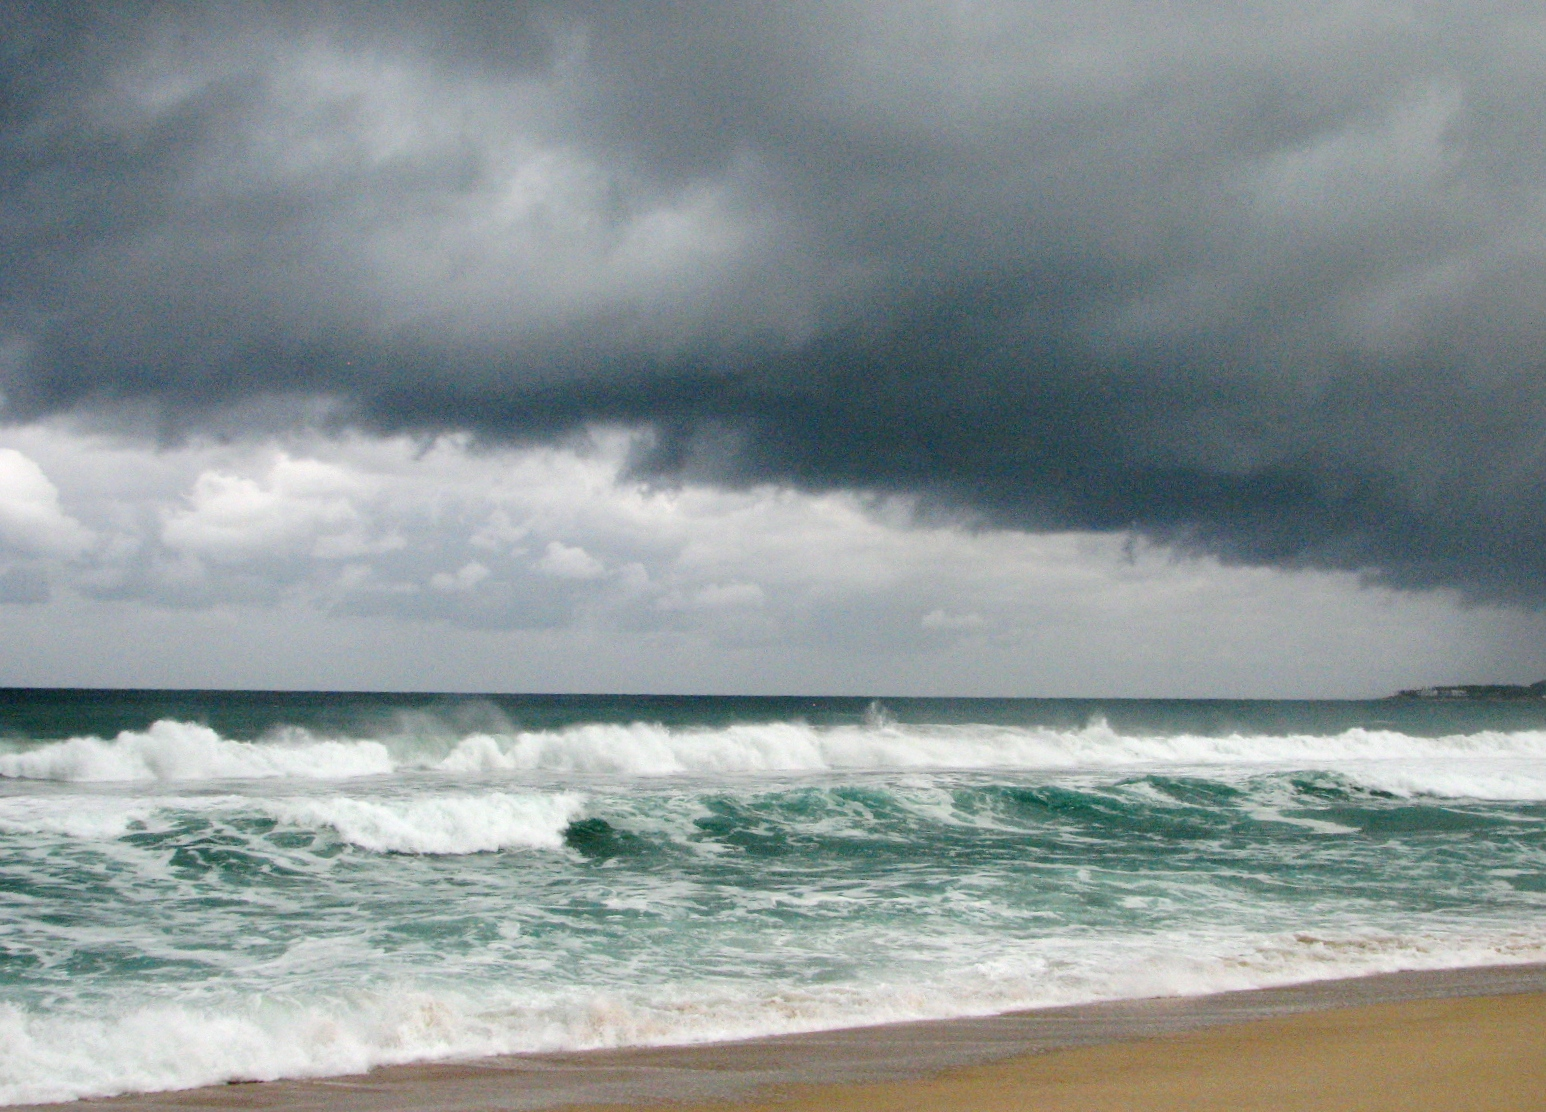 http://2.bp.blogspot.com/-TJsMbxXQEww/TralsHo4GGI/AAAAAAAAB7c/ro5tWSPyAGM/s1600/Baja_California_Hurricane_Rick.jpg